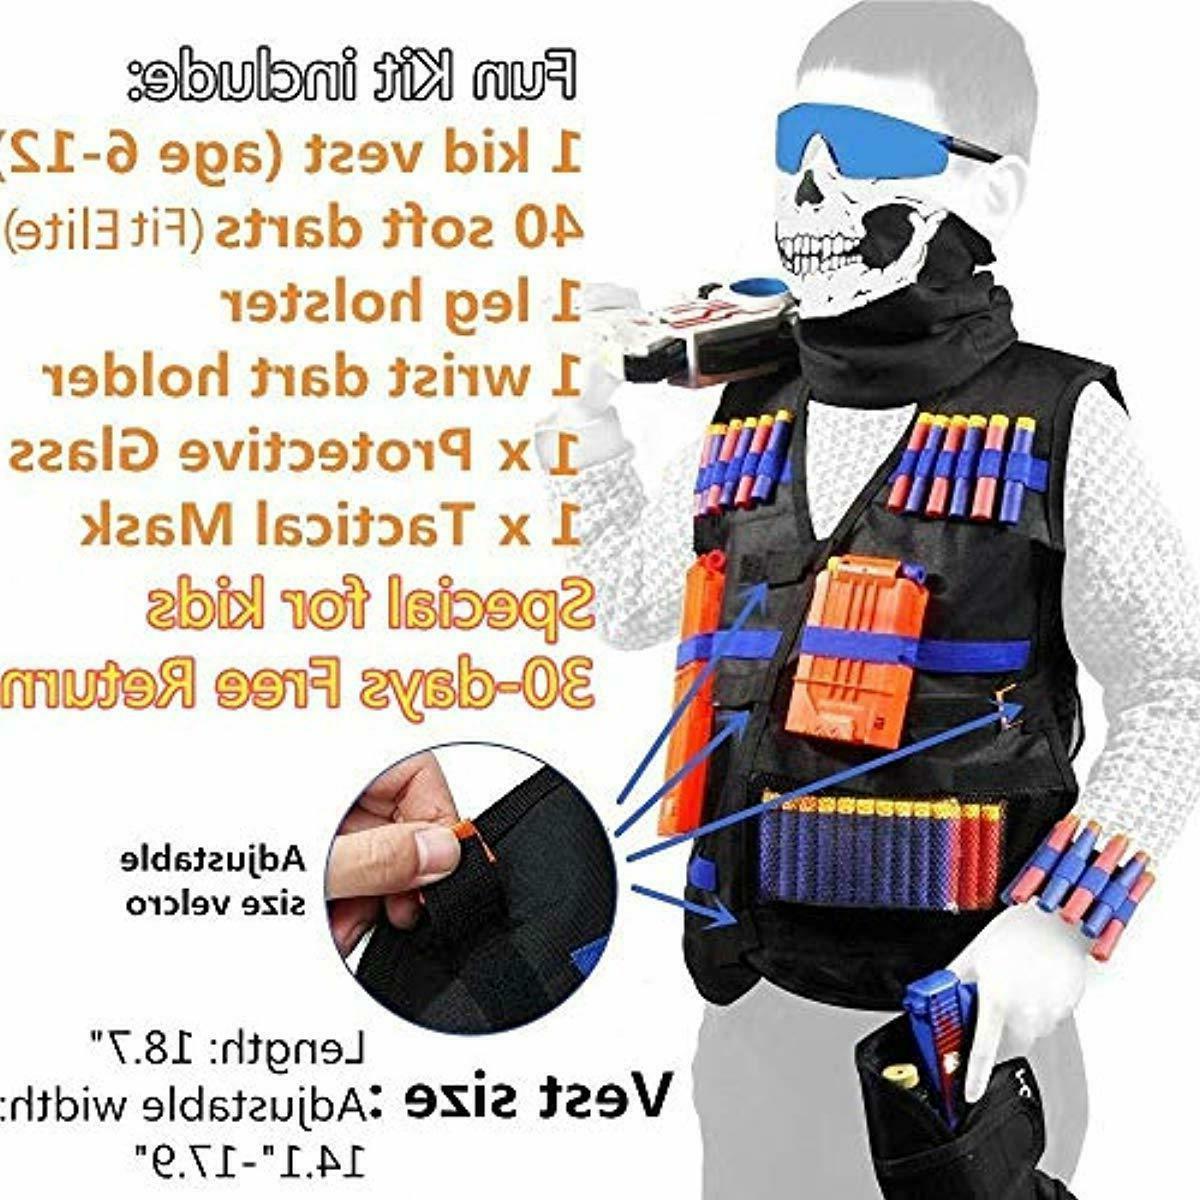 tactical vest kit with foam darts bullet